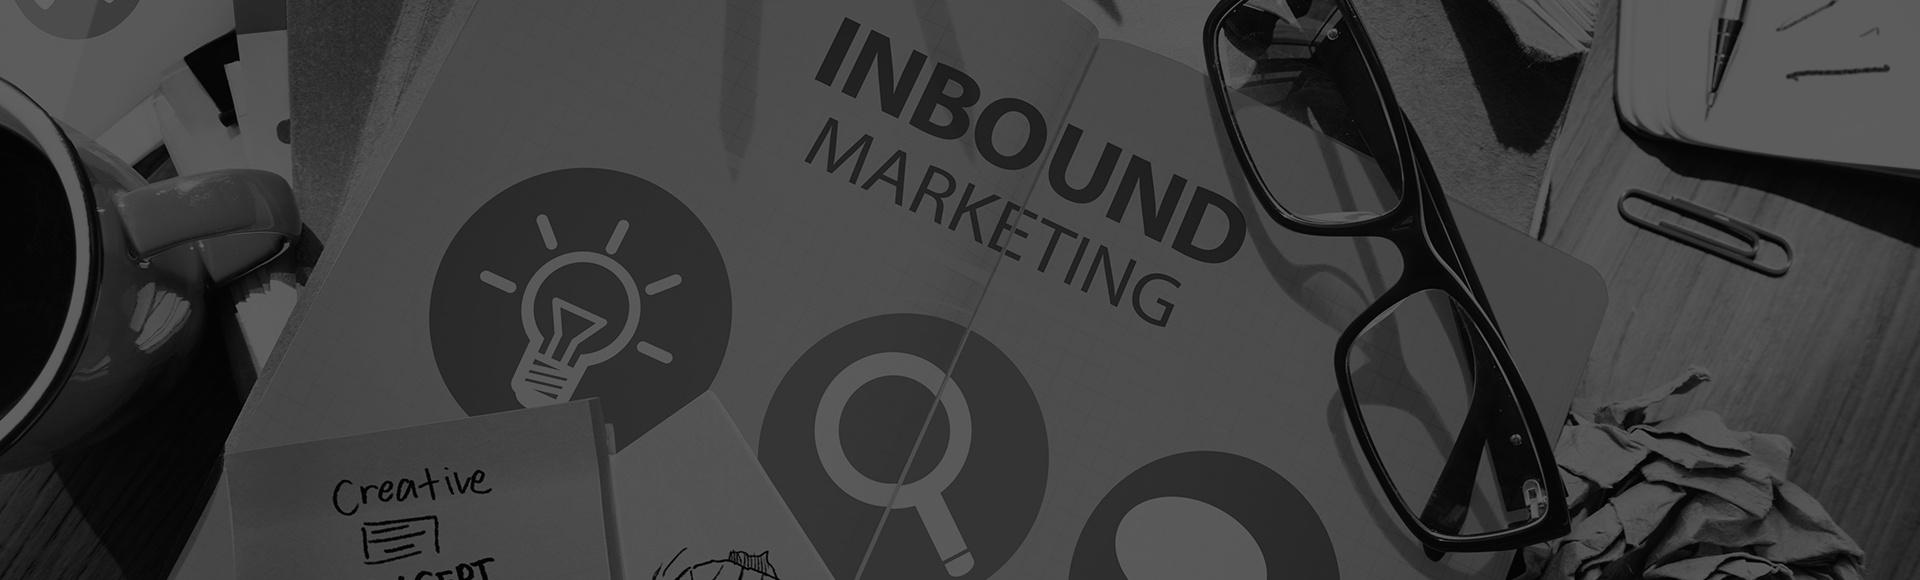 Inbound Marketing Services with Nexa, Dubai